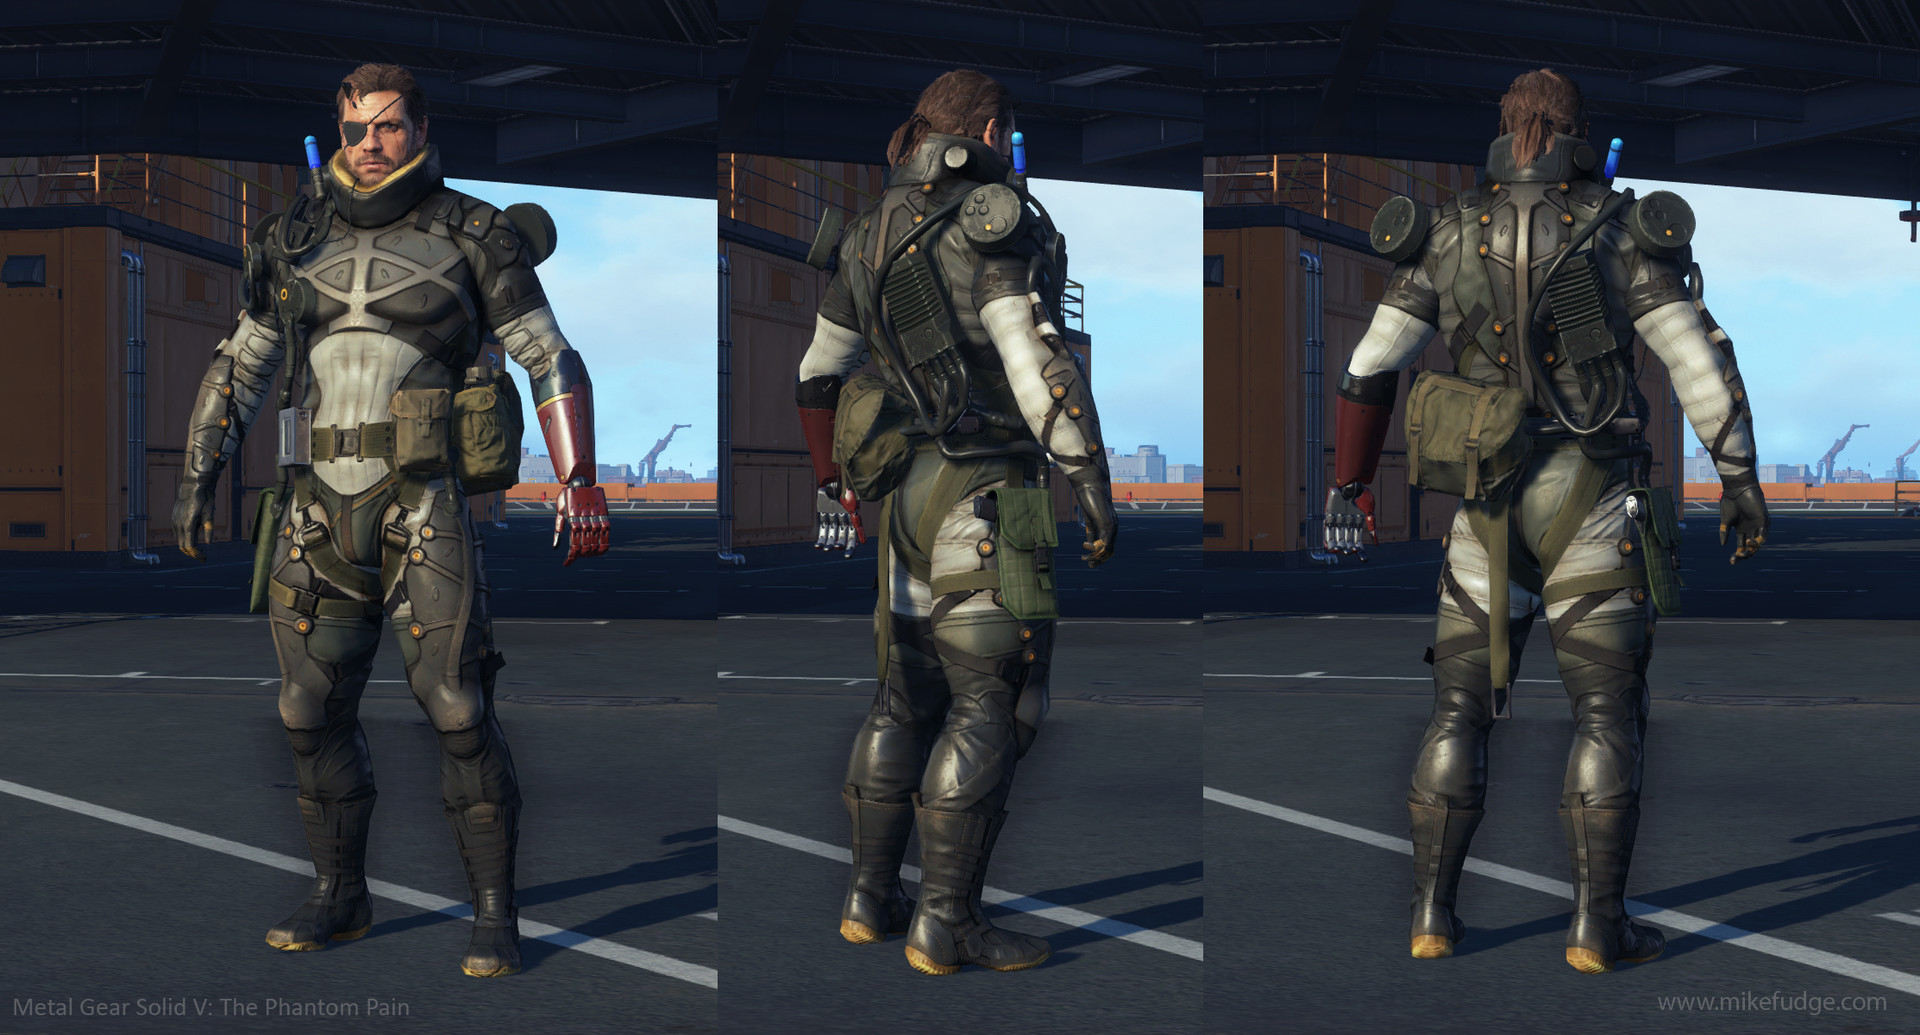 Metal Gear Solid V The Phantom Pain Concept Art